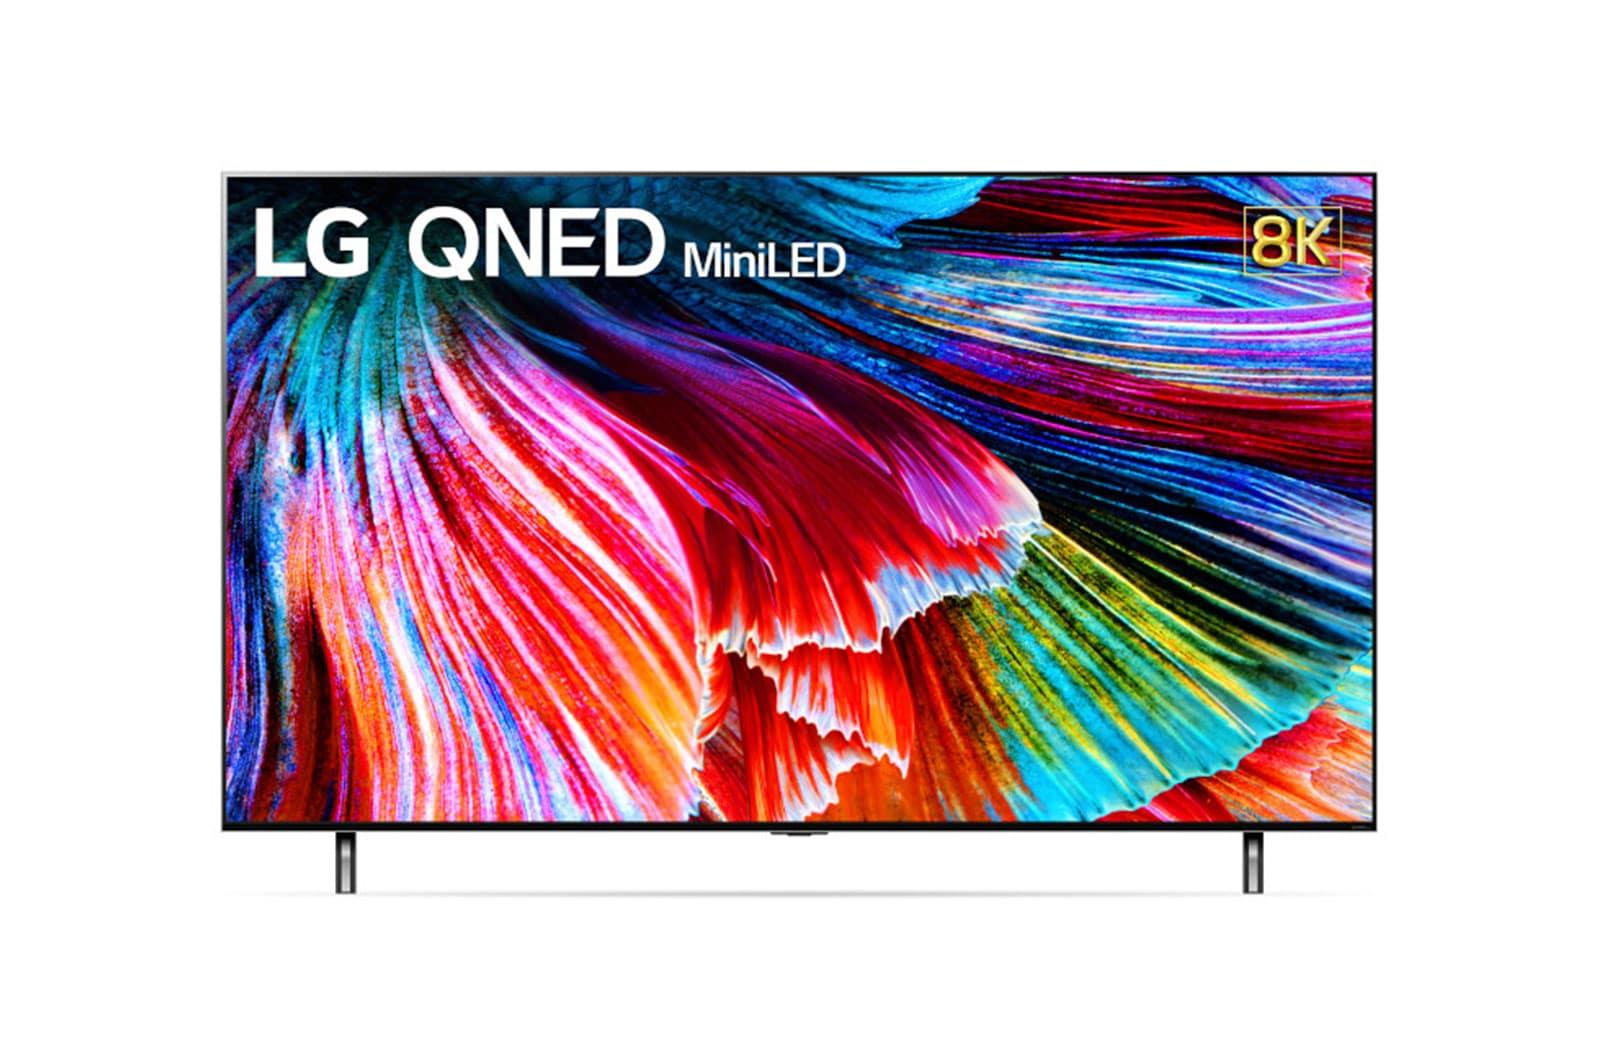 LG Mini DEL QNED99 8K Téléviseur Intelligent de 65 po (65QNED99UPA)